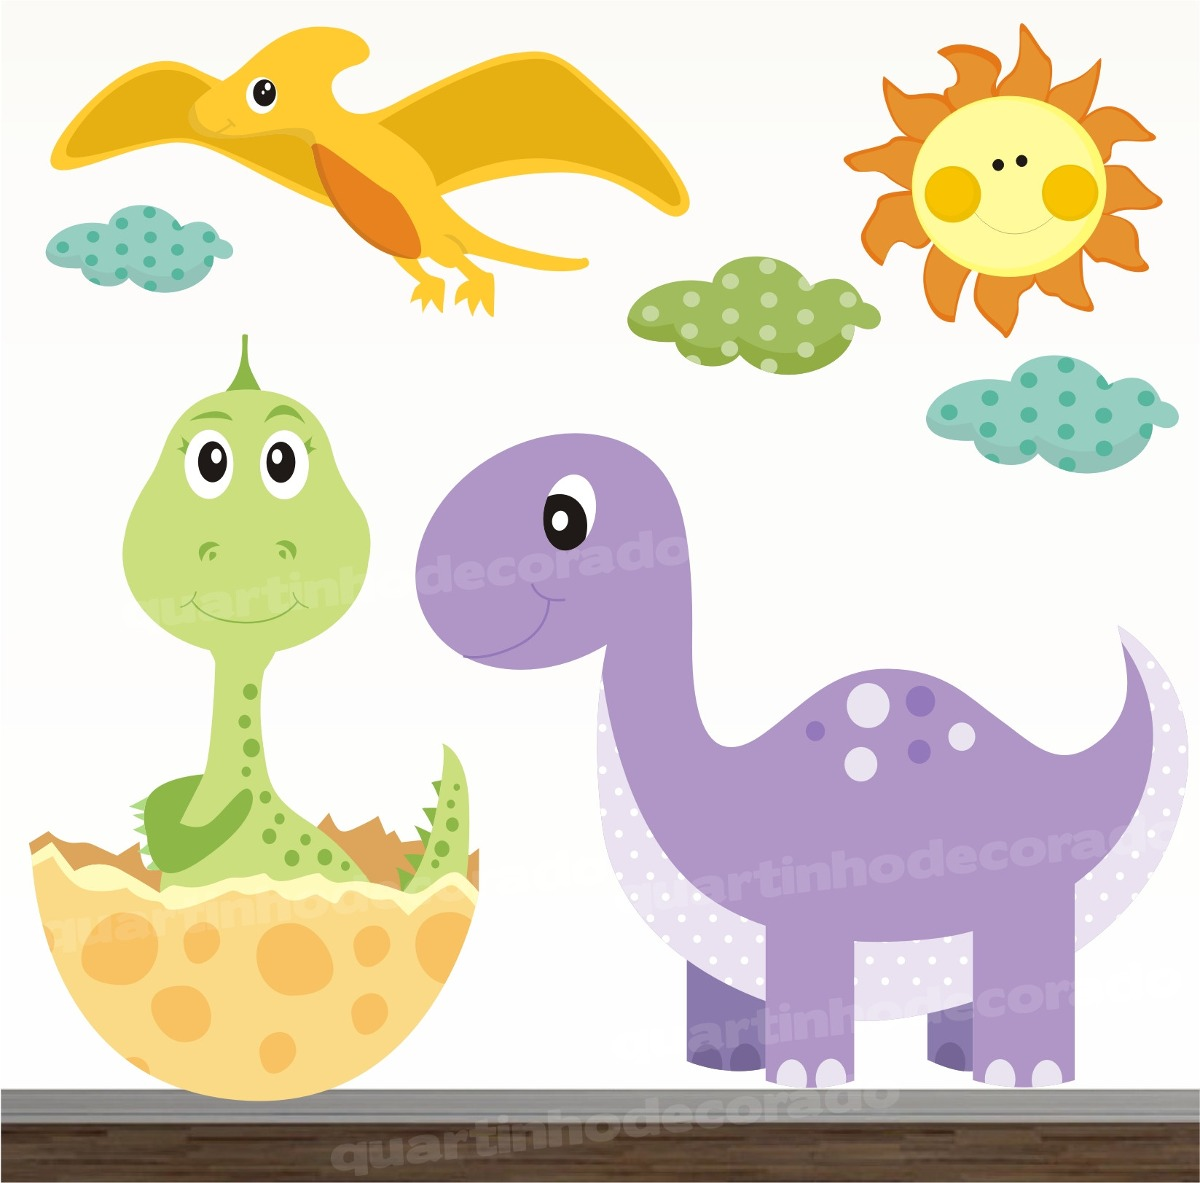 Adesivo Dinossauro Infantil Zoo Kits Completos Ja Recortados R